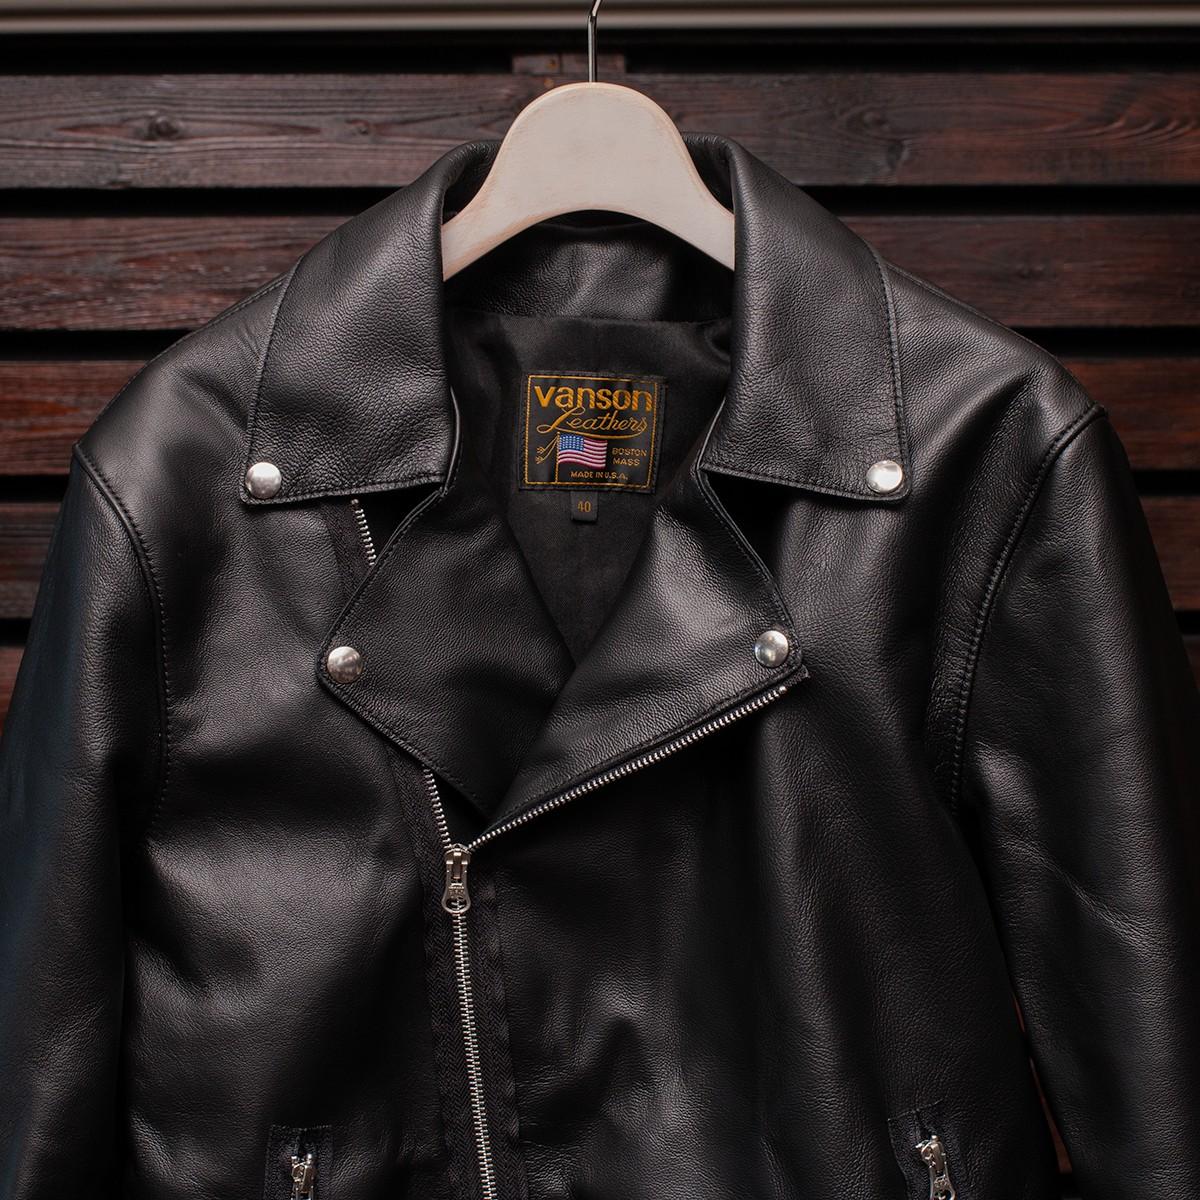 Vanson Special Custom Double Riders Jacket Type 2 ゴートスキン ライダースジャケット (2021FW カスタムオーダー)